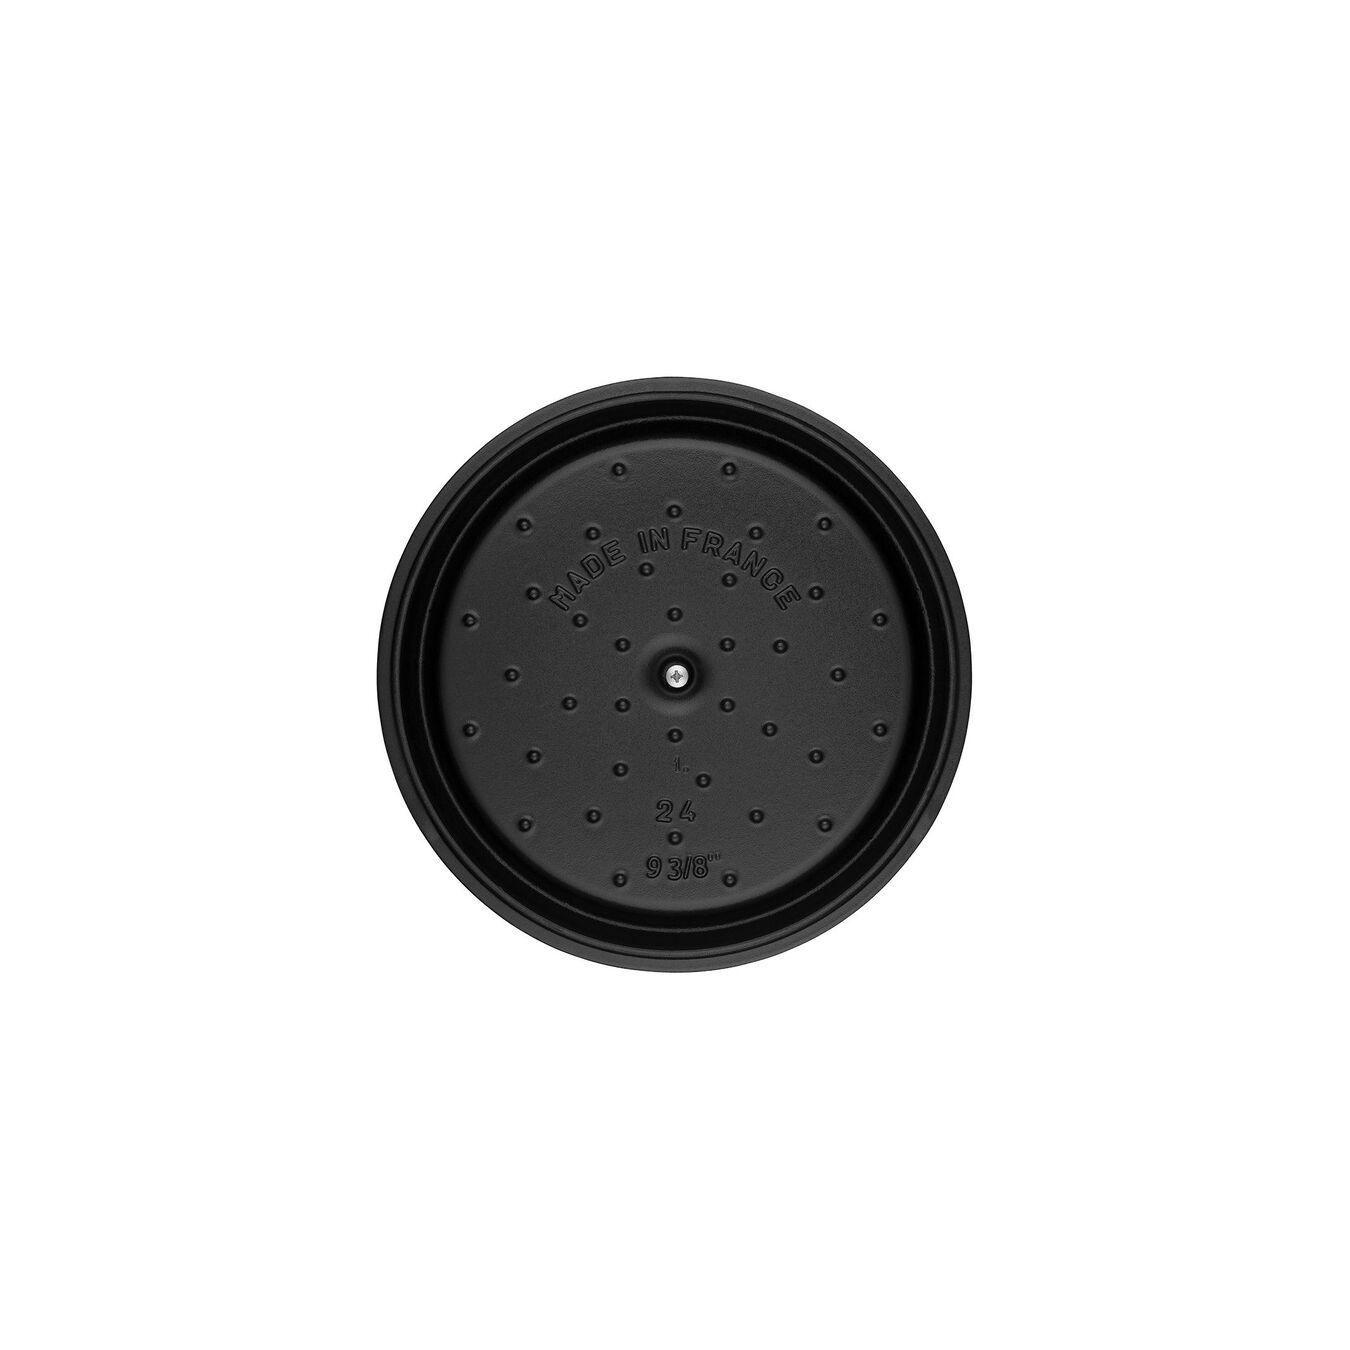 Döküm Tencere | Siyah | 24 cm | 3,8 l | yuvarlak,,large 6